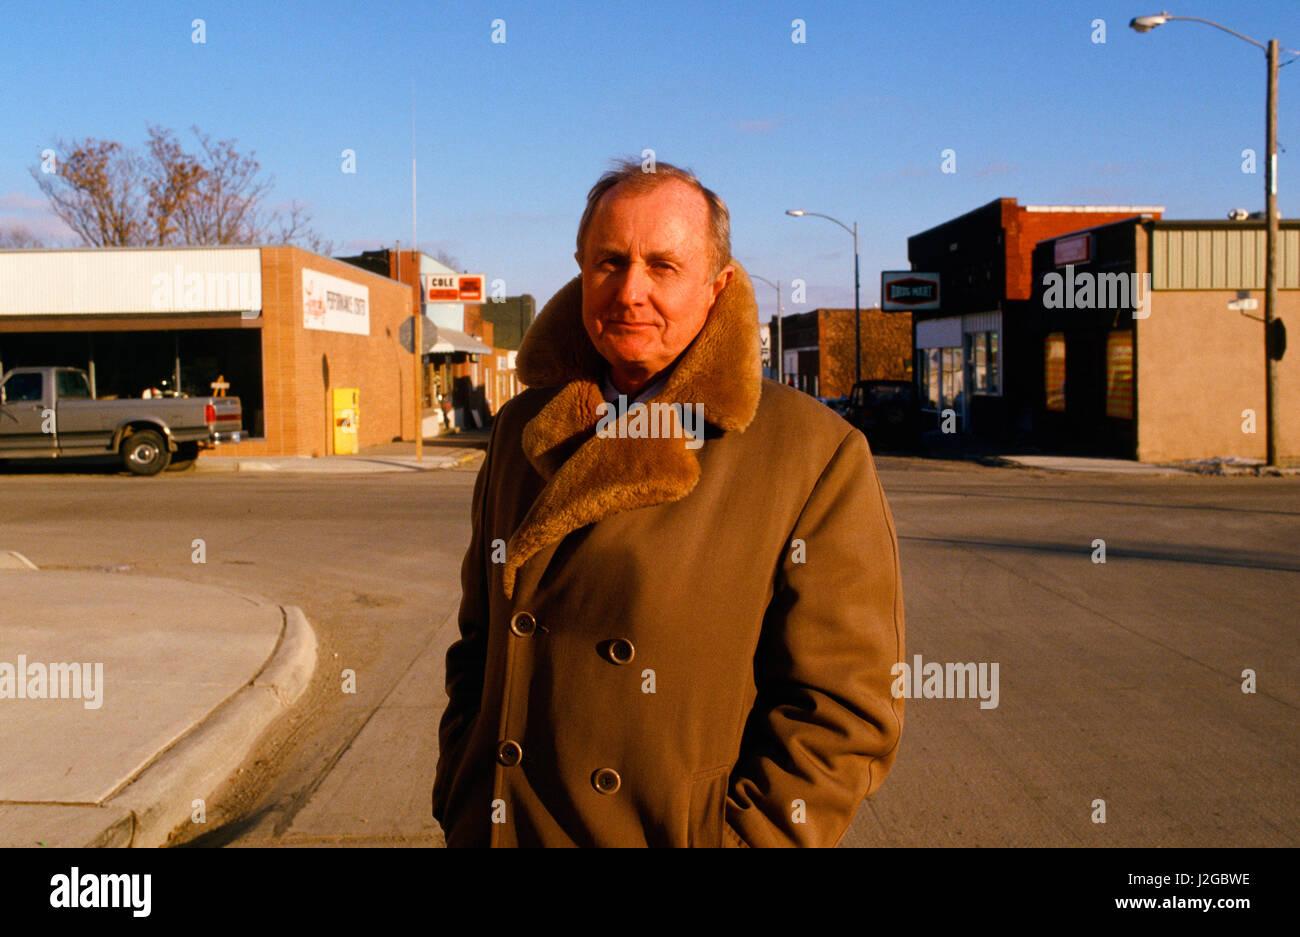 Hugh Sidey on the Main Street of Greenfield, Iowa, his hometown, during the Iowa Caucus Season. - Stock Image